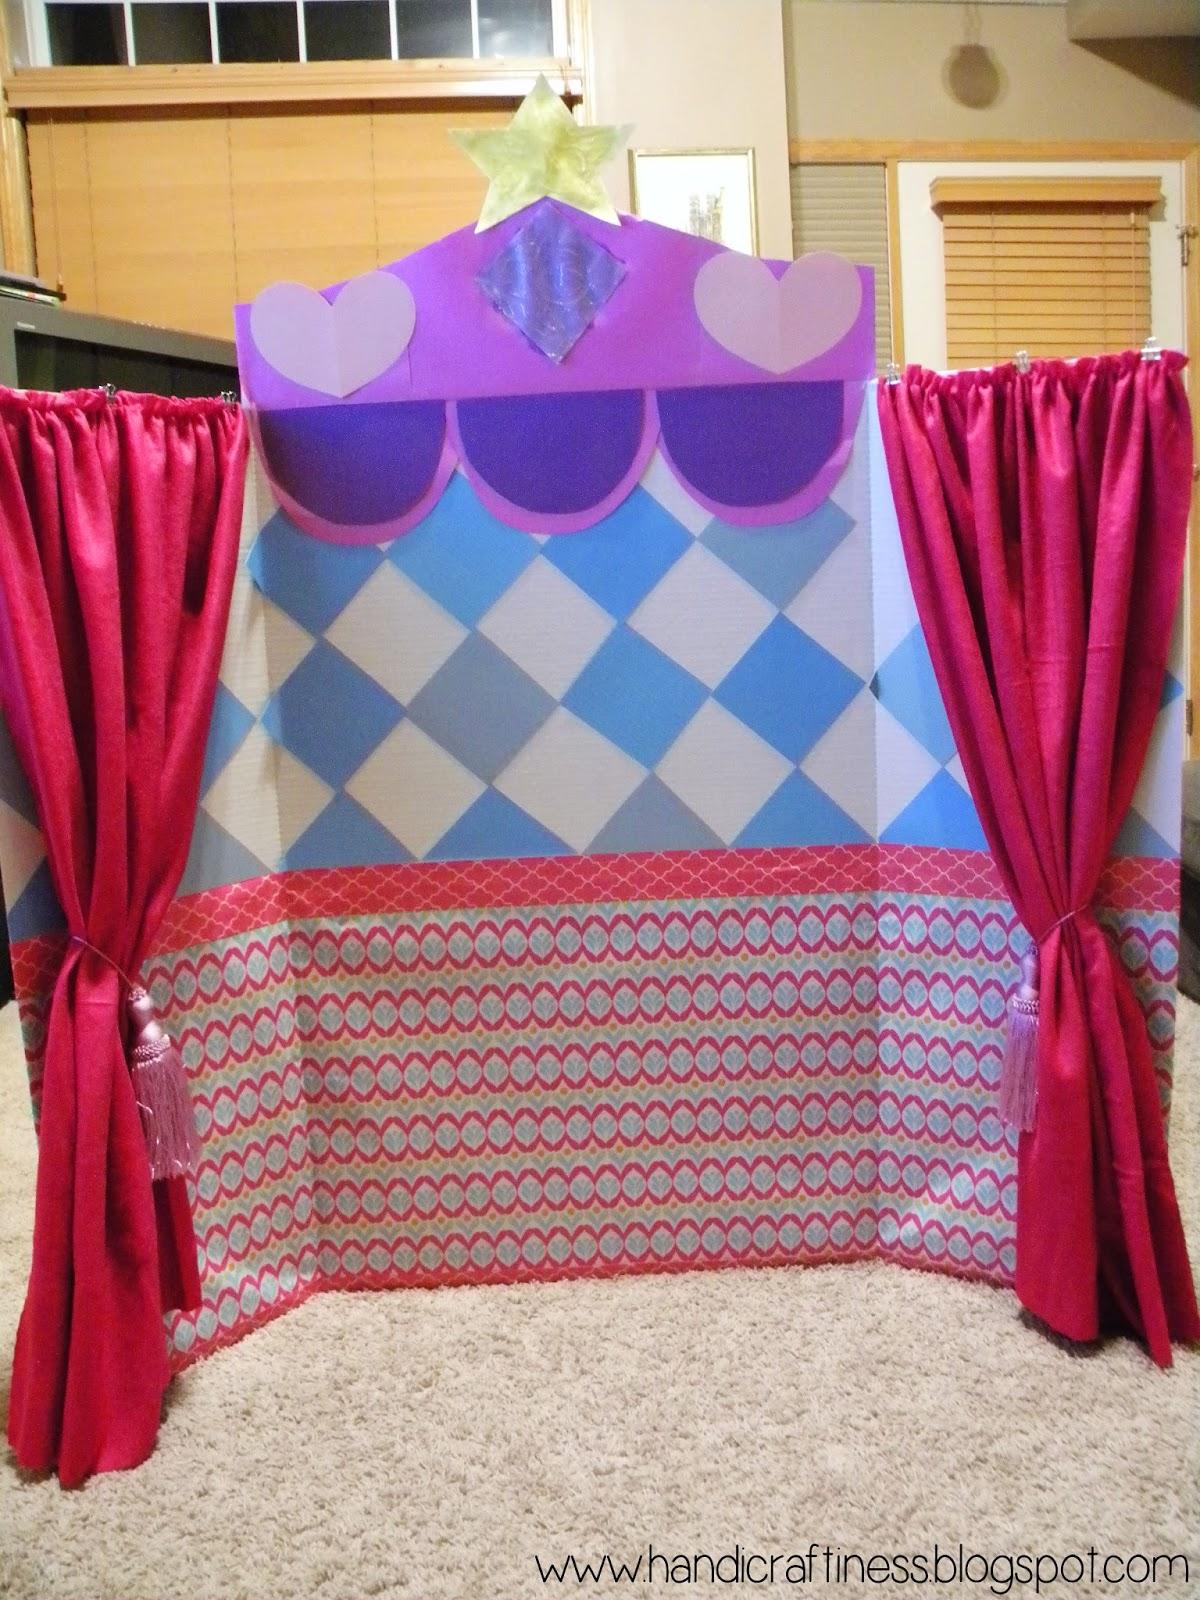 The Pretty Kitty Studio : DIY My Little Pony Party Decor